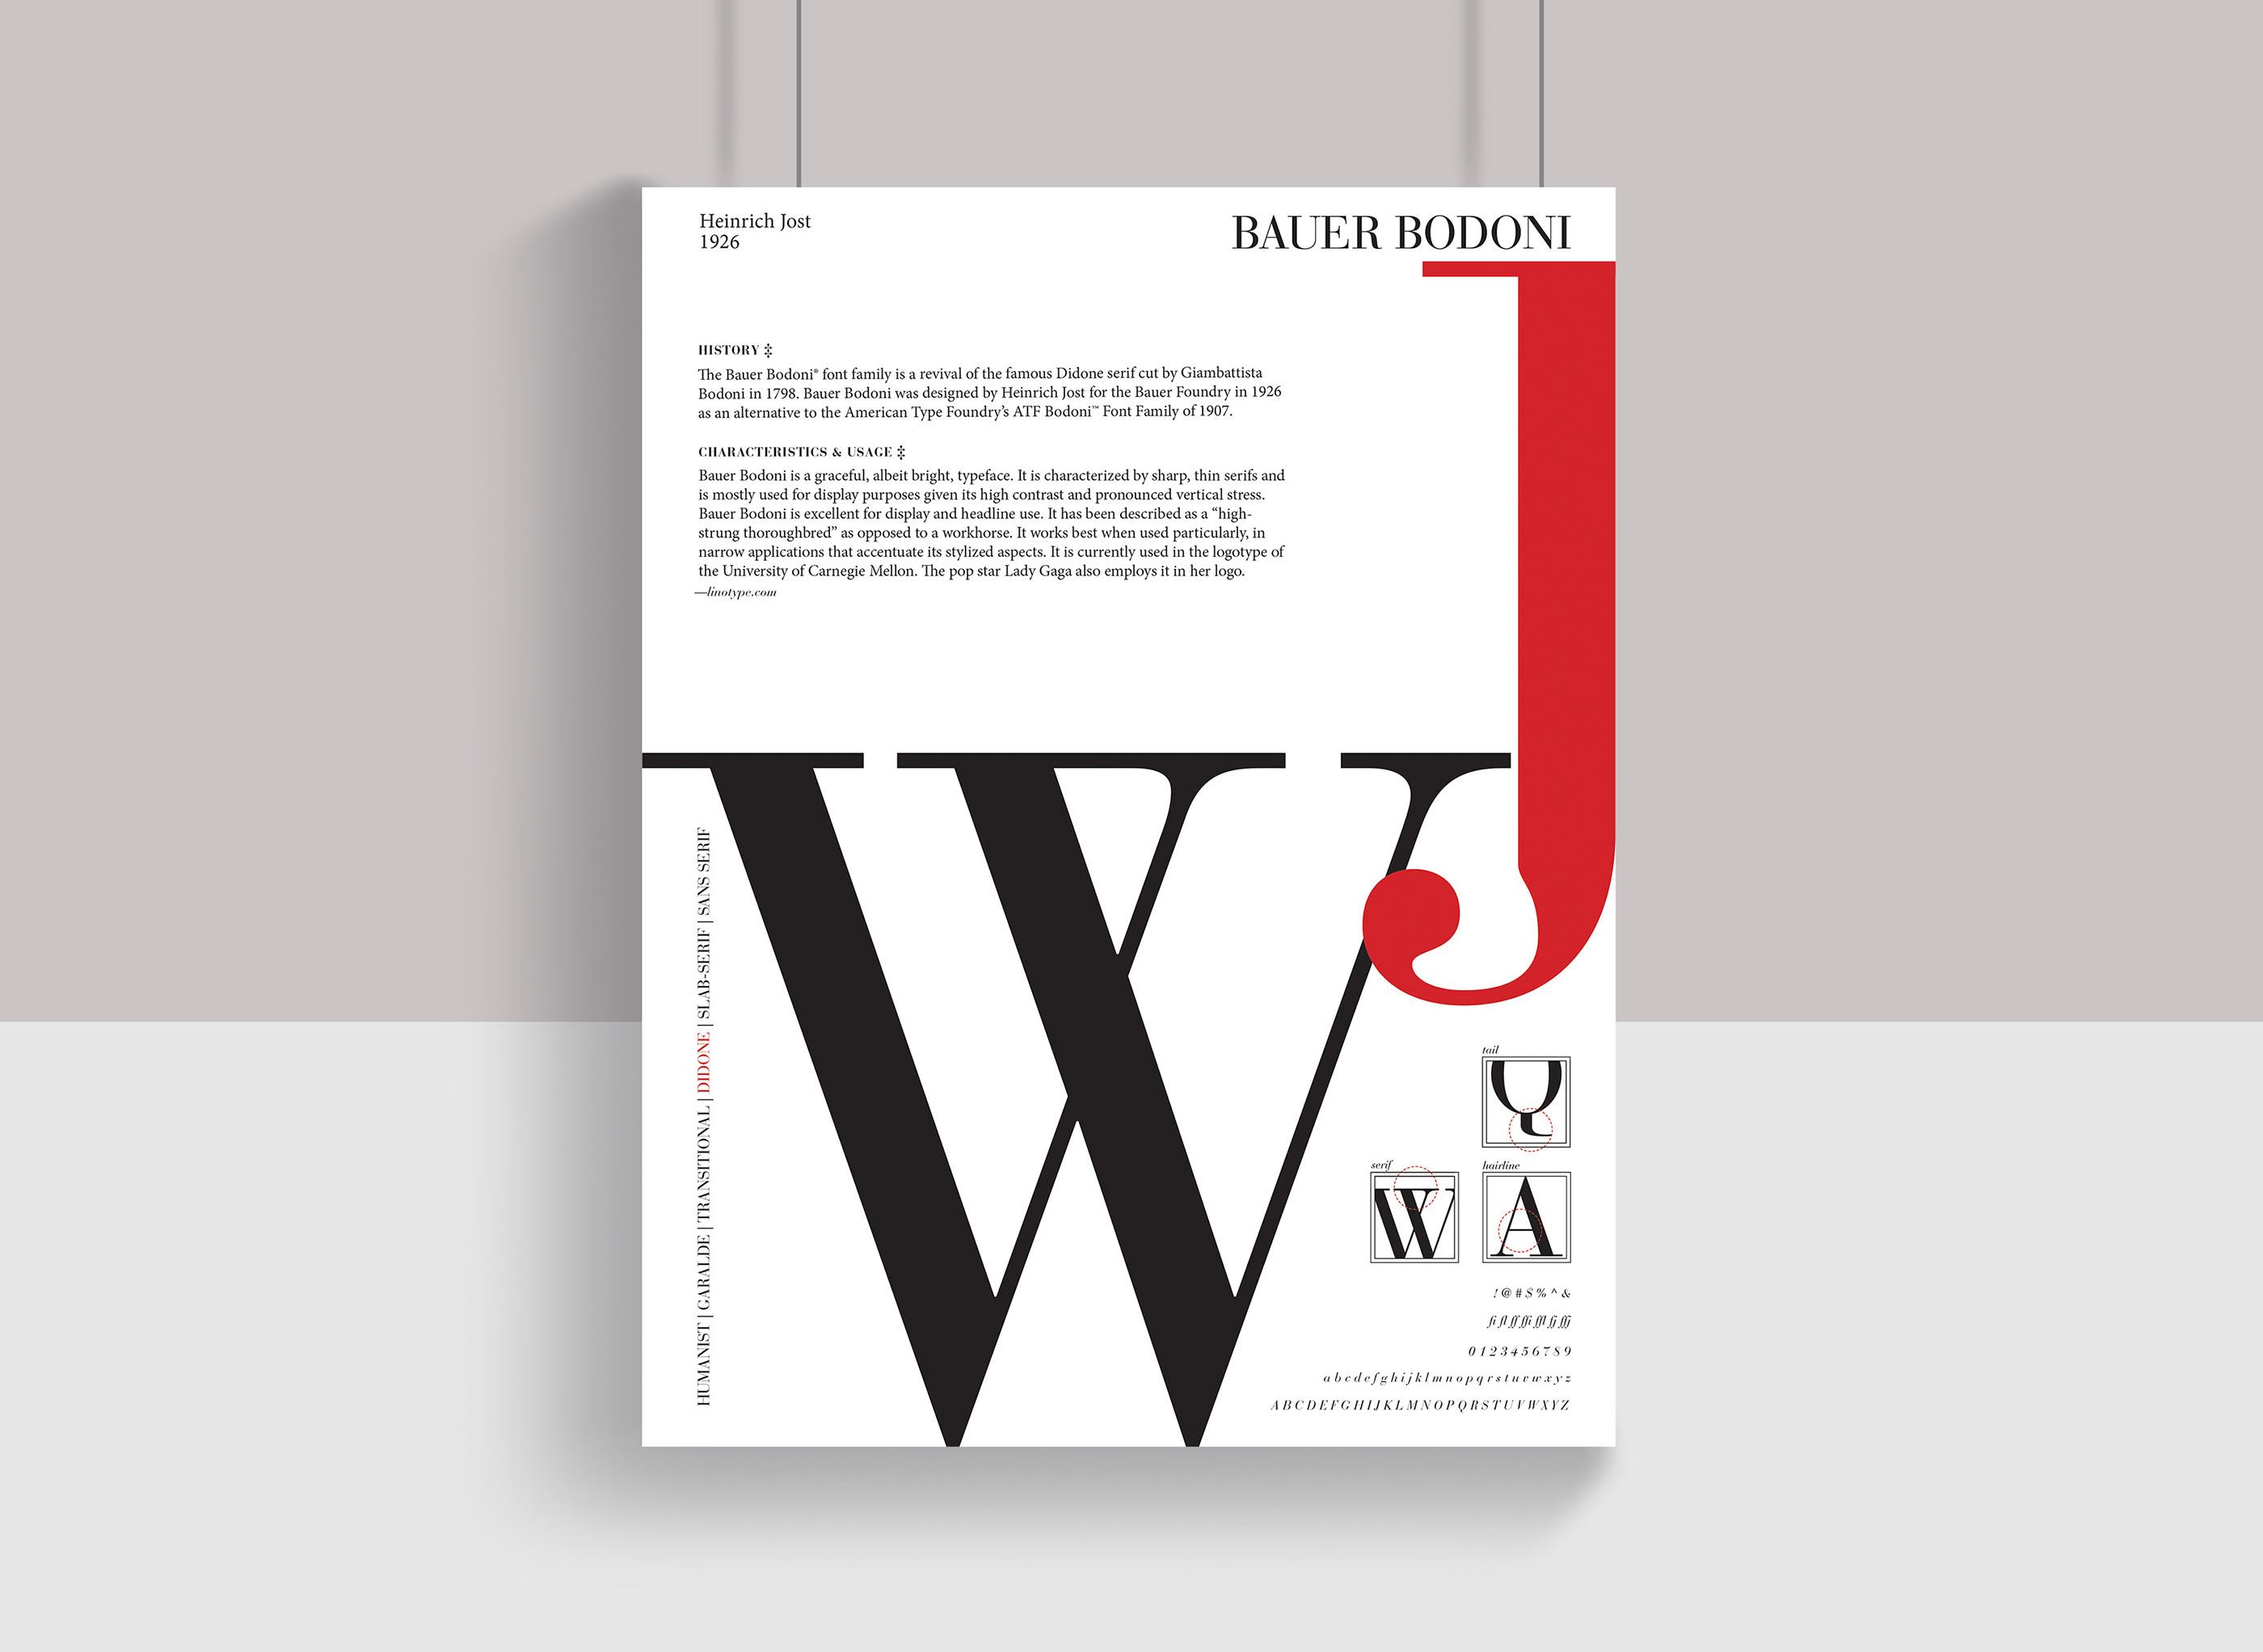 Celebrating Typography | Typographic Posters on Behance